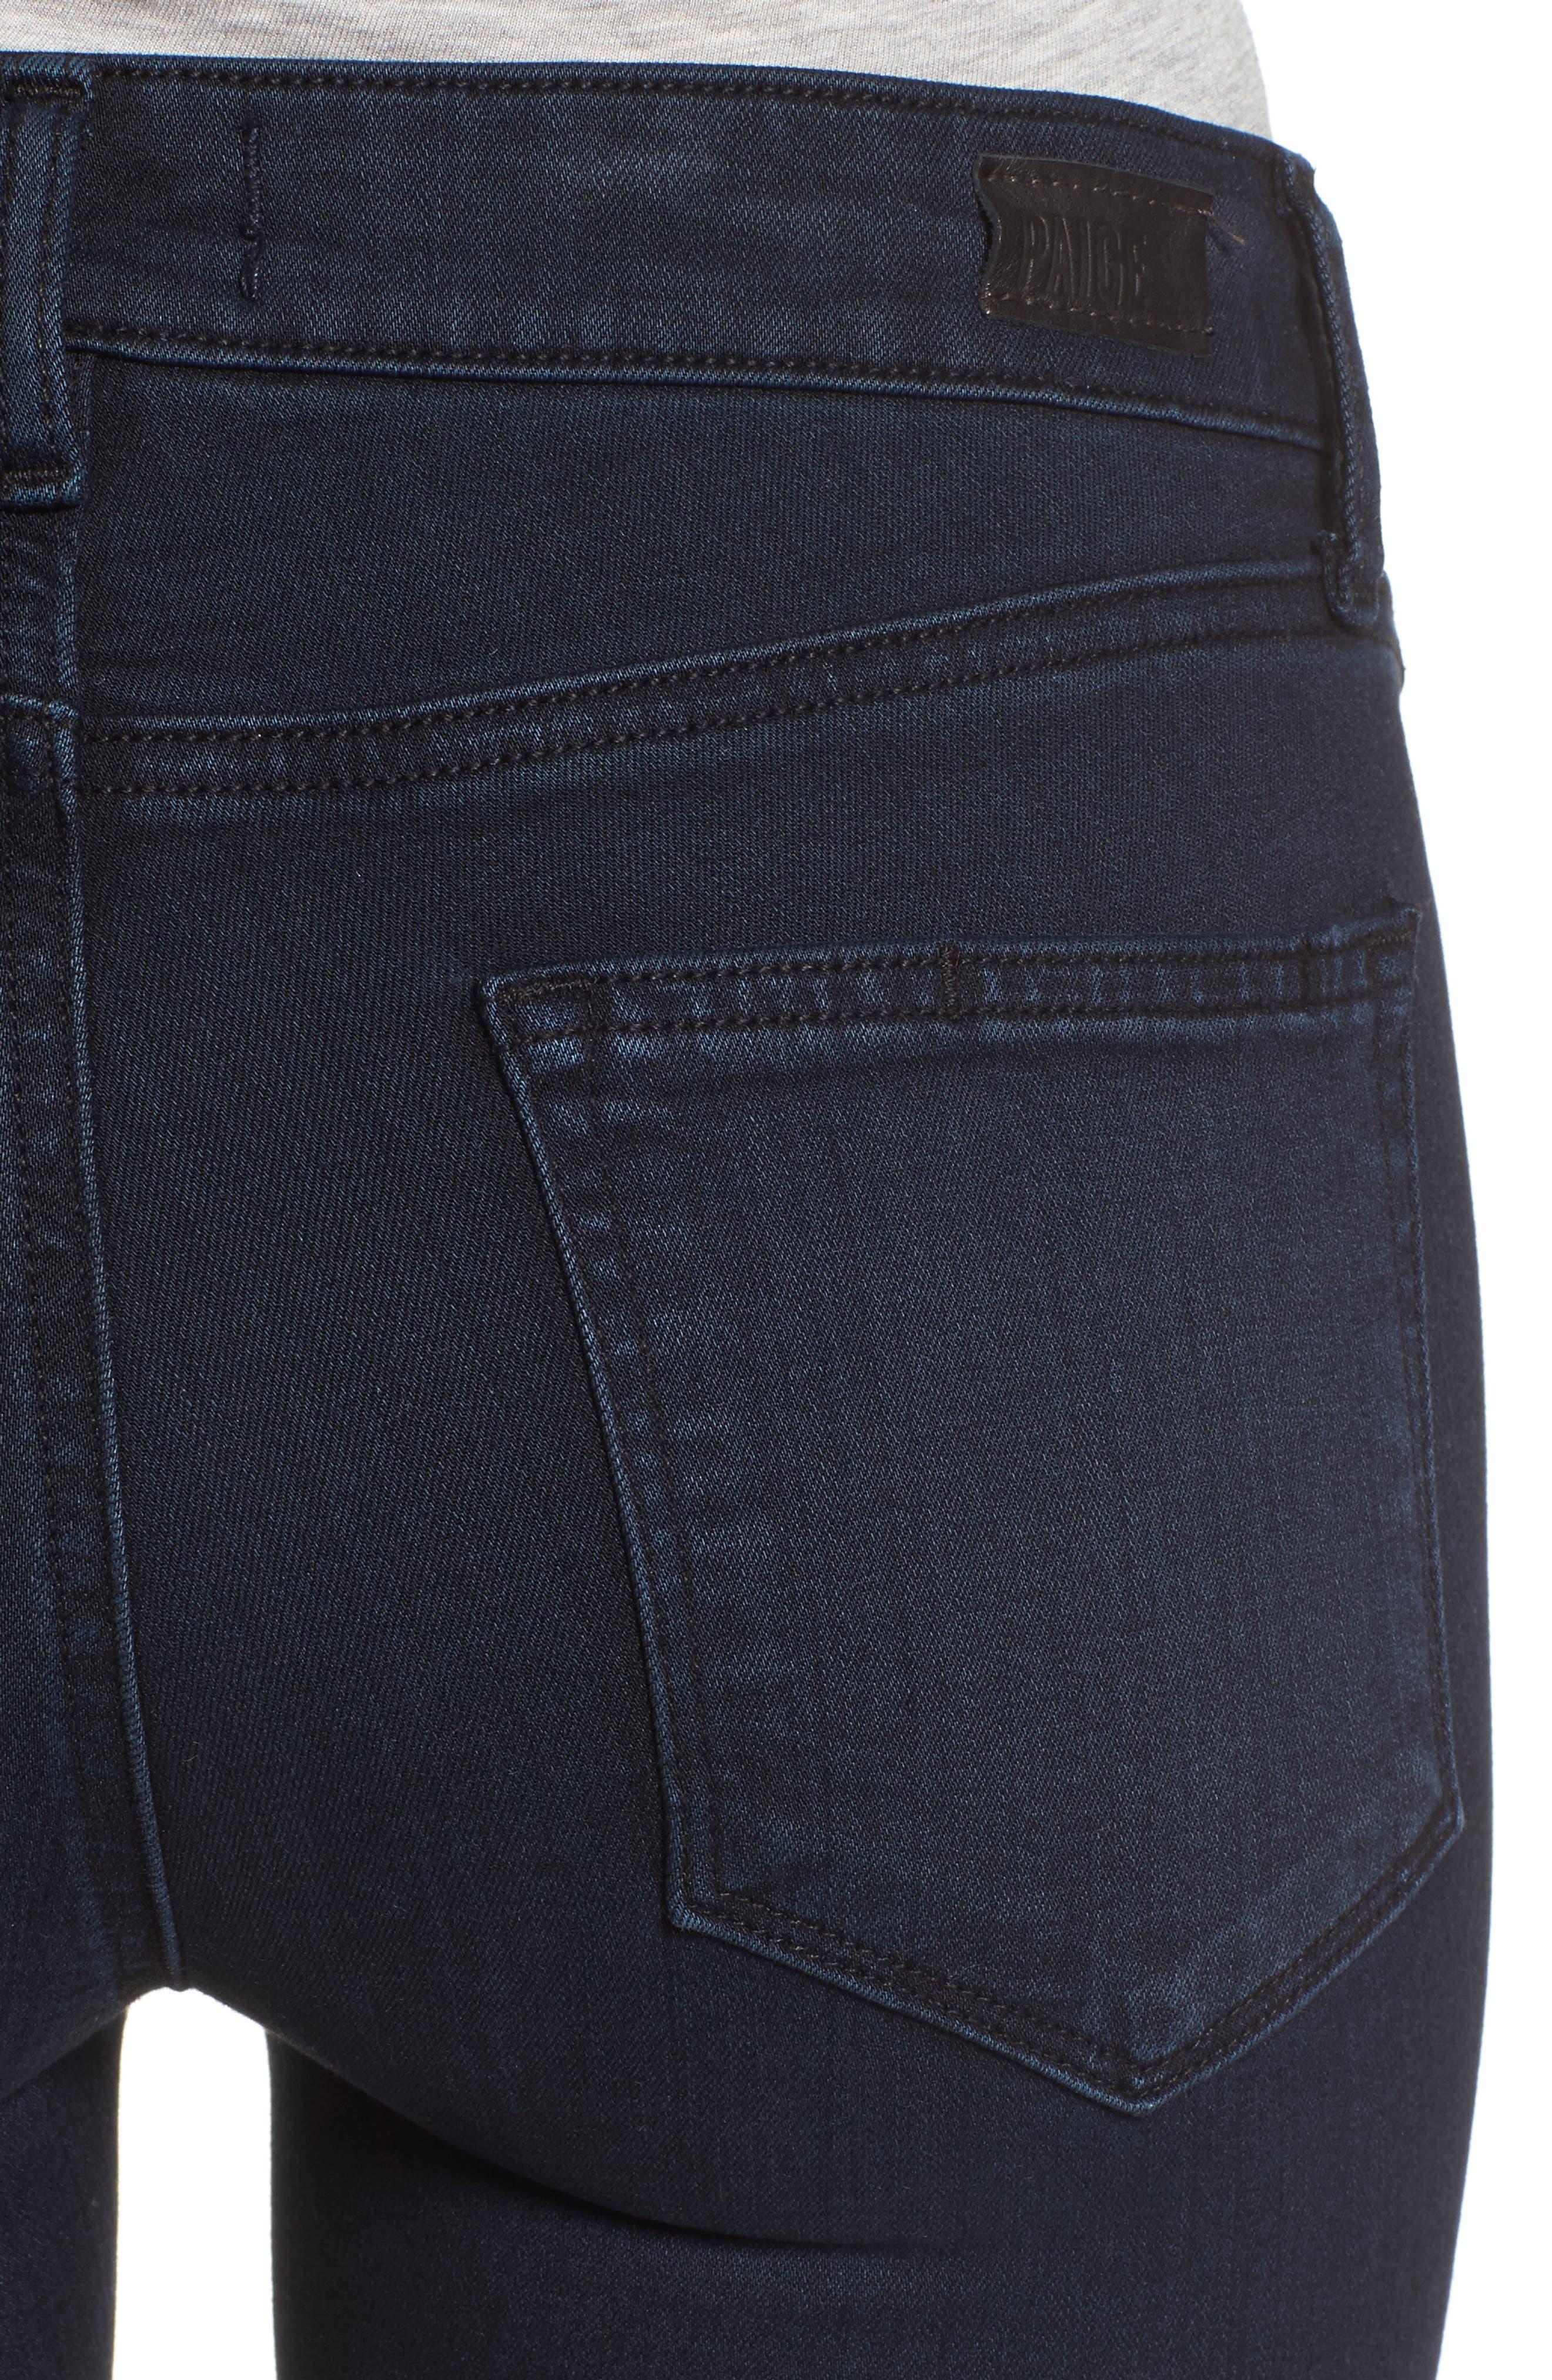 Manhattan High Waist Bootcut Jeans,                             Alternate thumbnail 8, color,